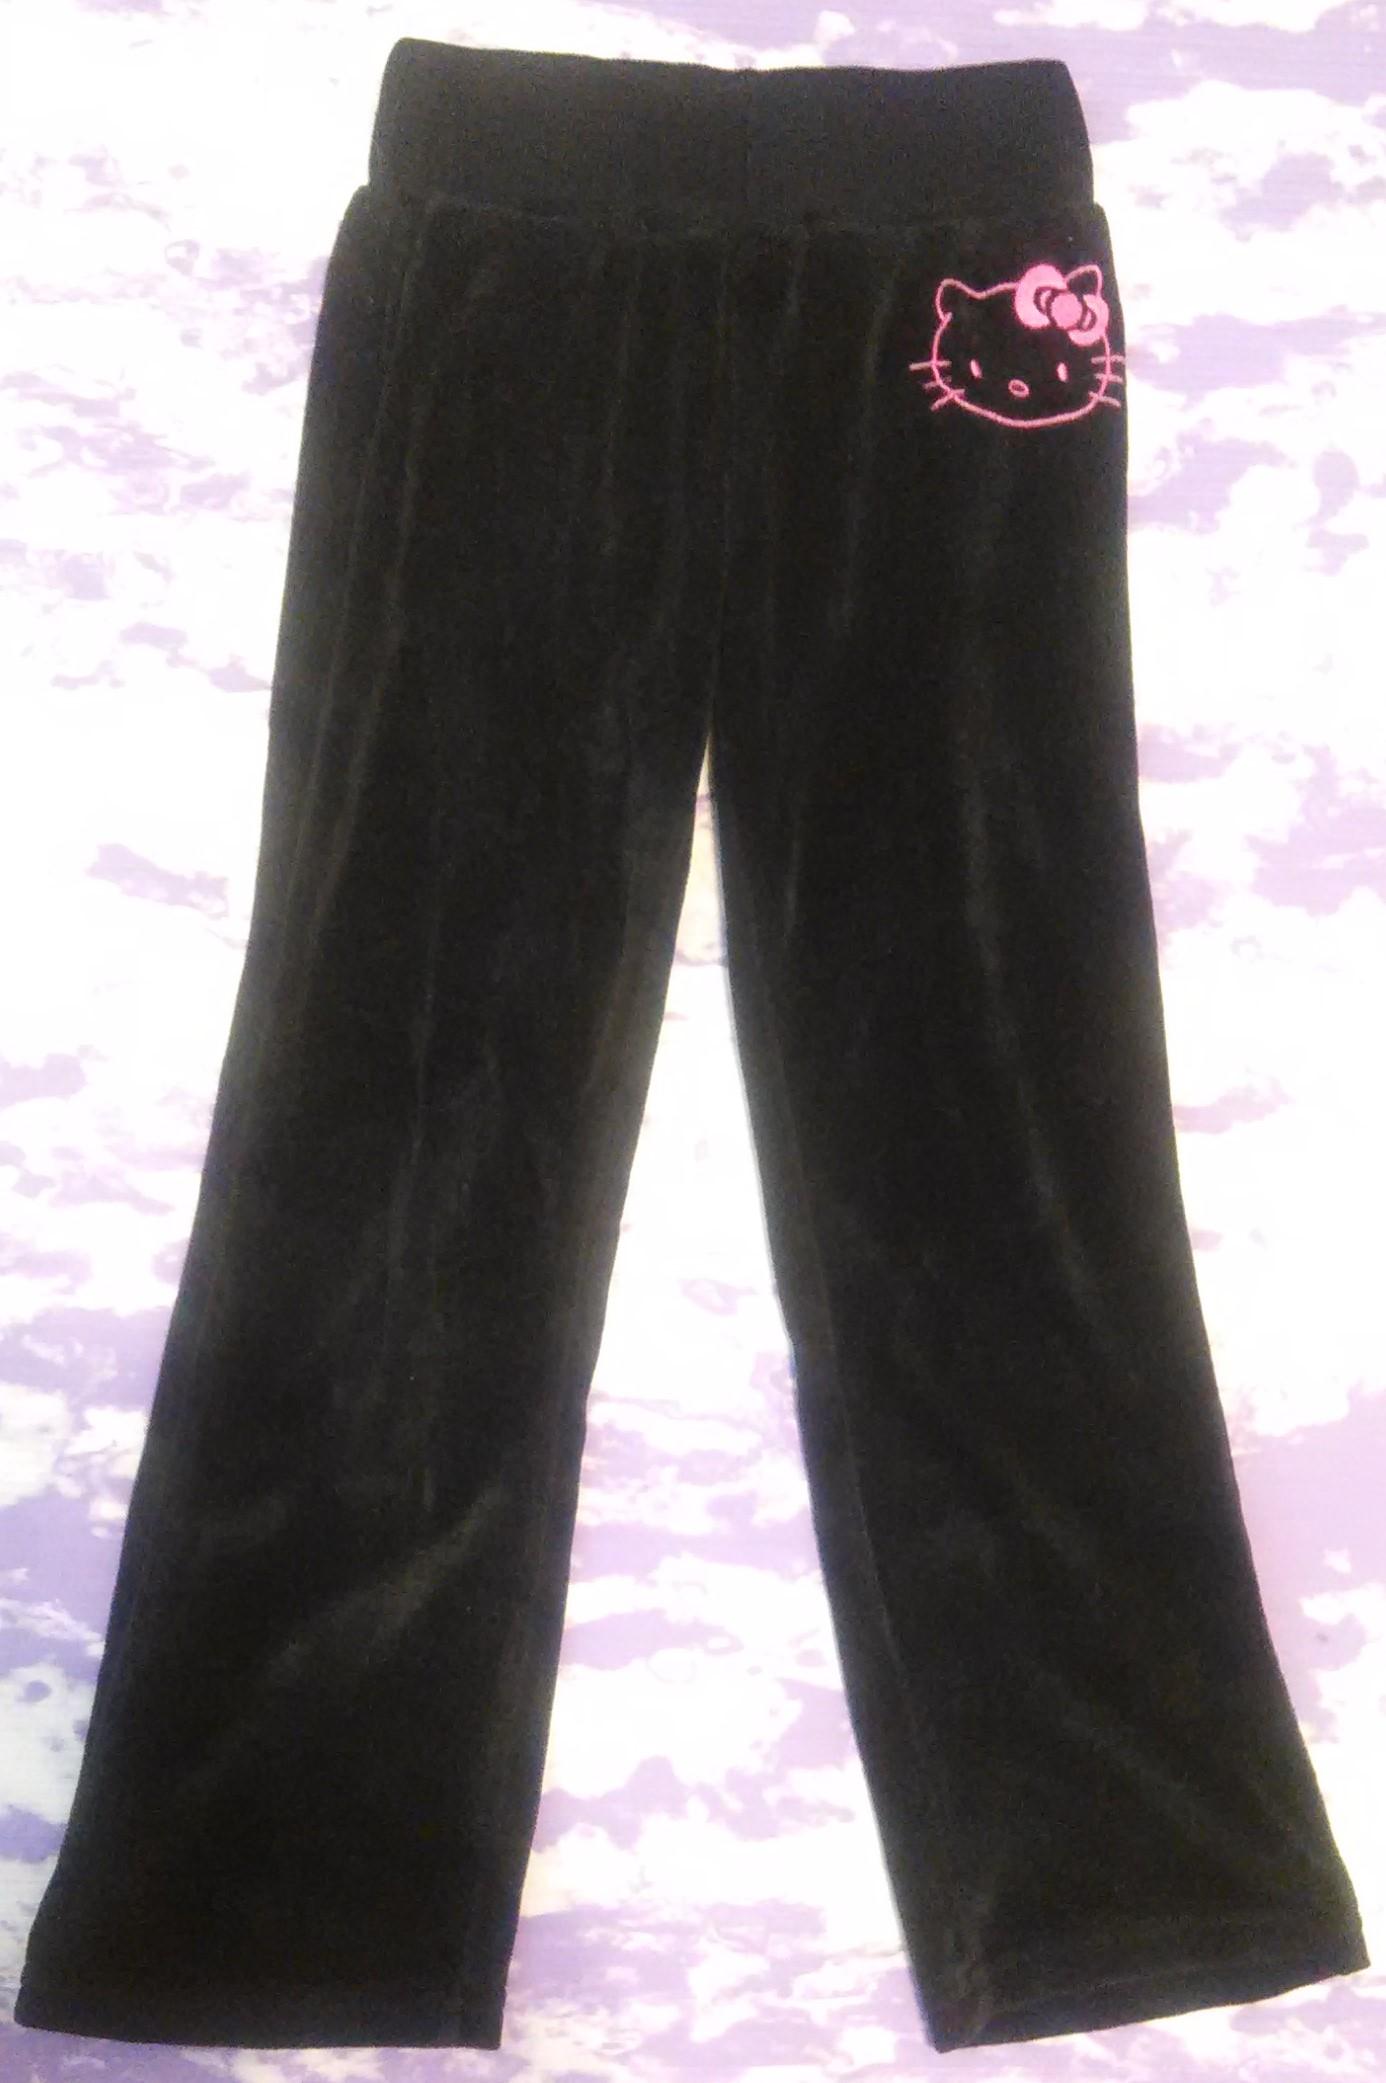 fdef75e9b Hello Kitty Pants - Black on Storenvy